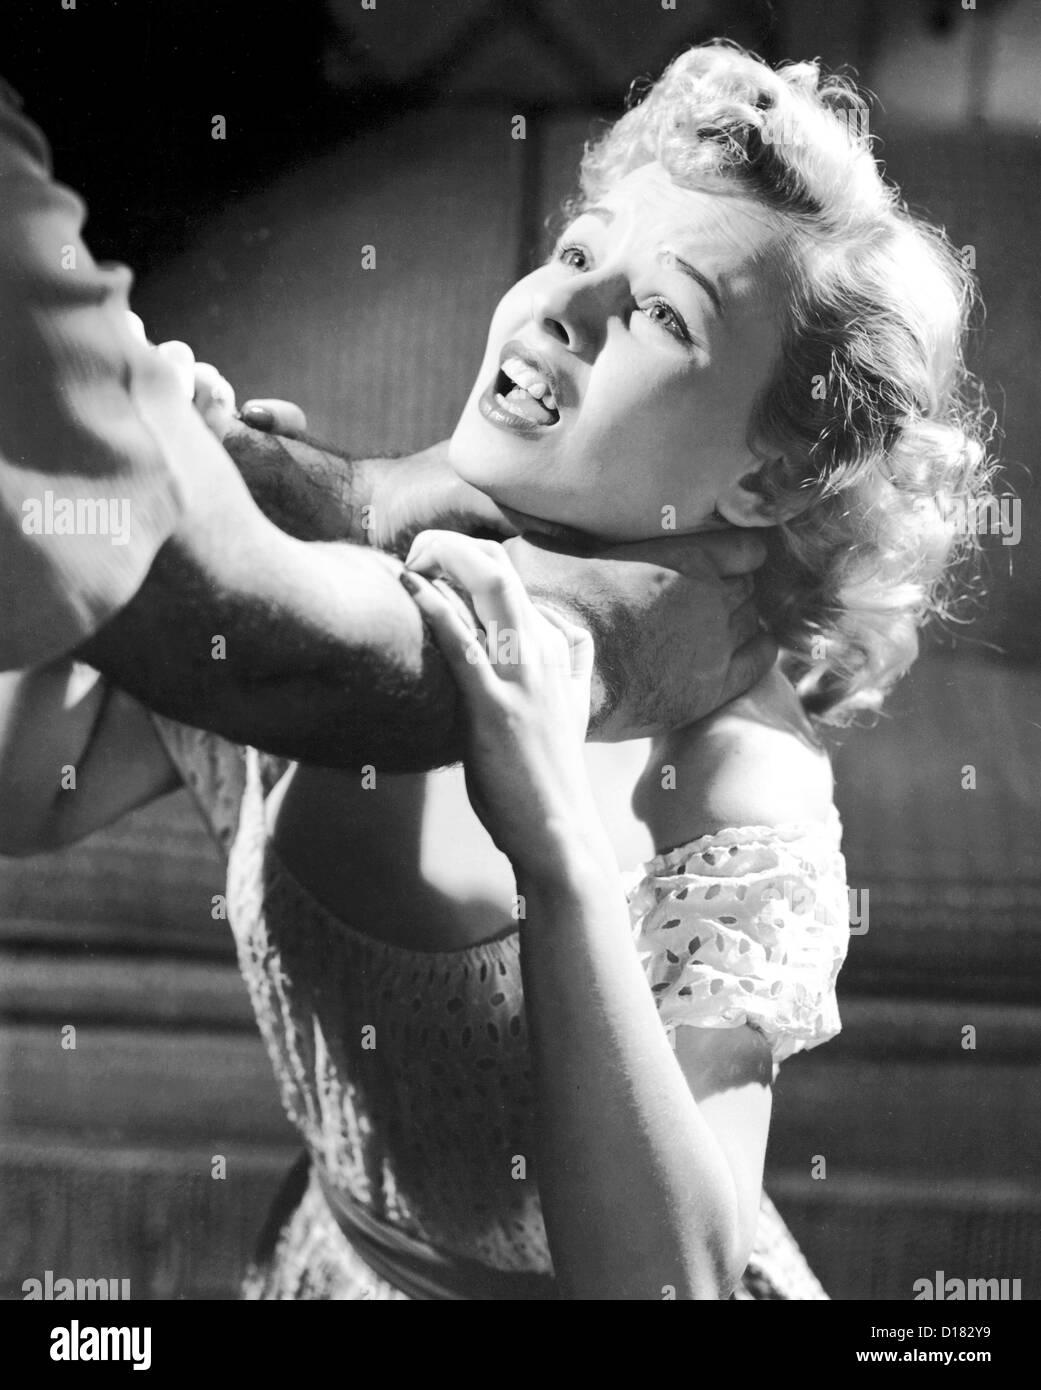 man strangling woman stock photo 52423709 alamy